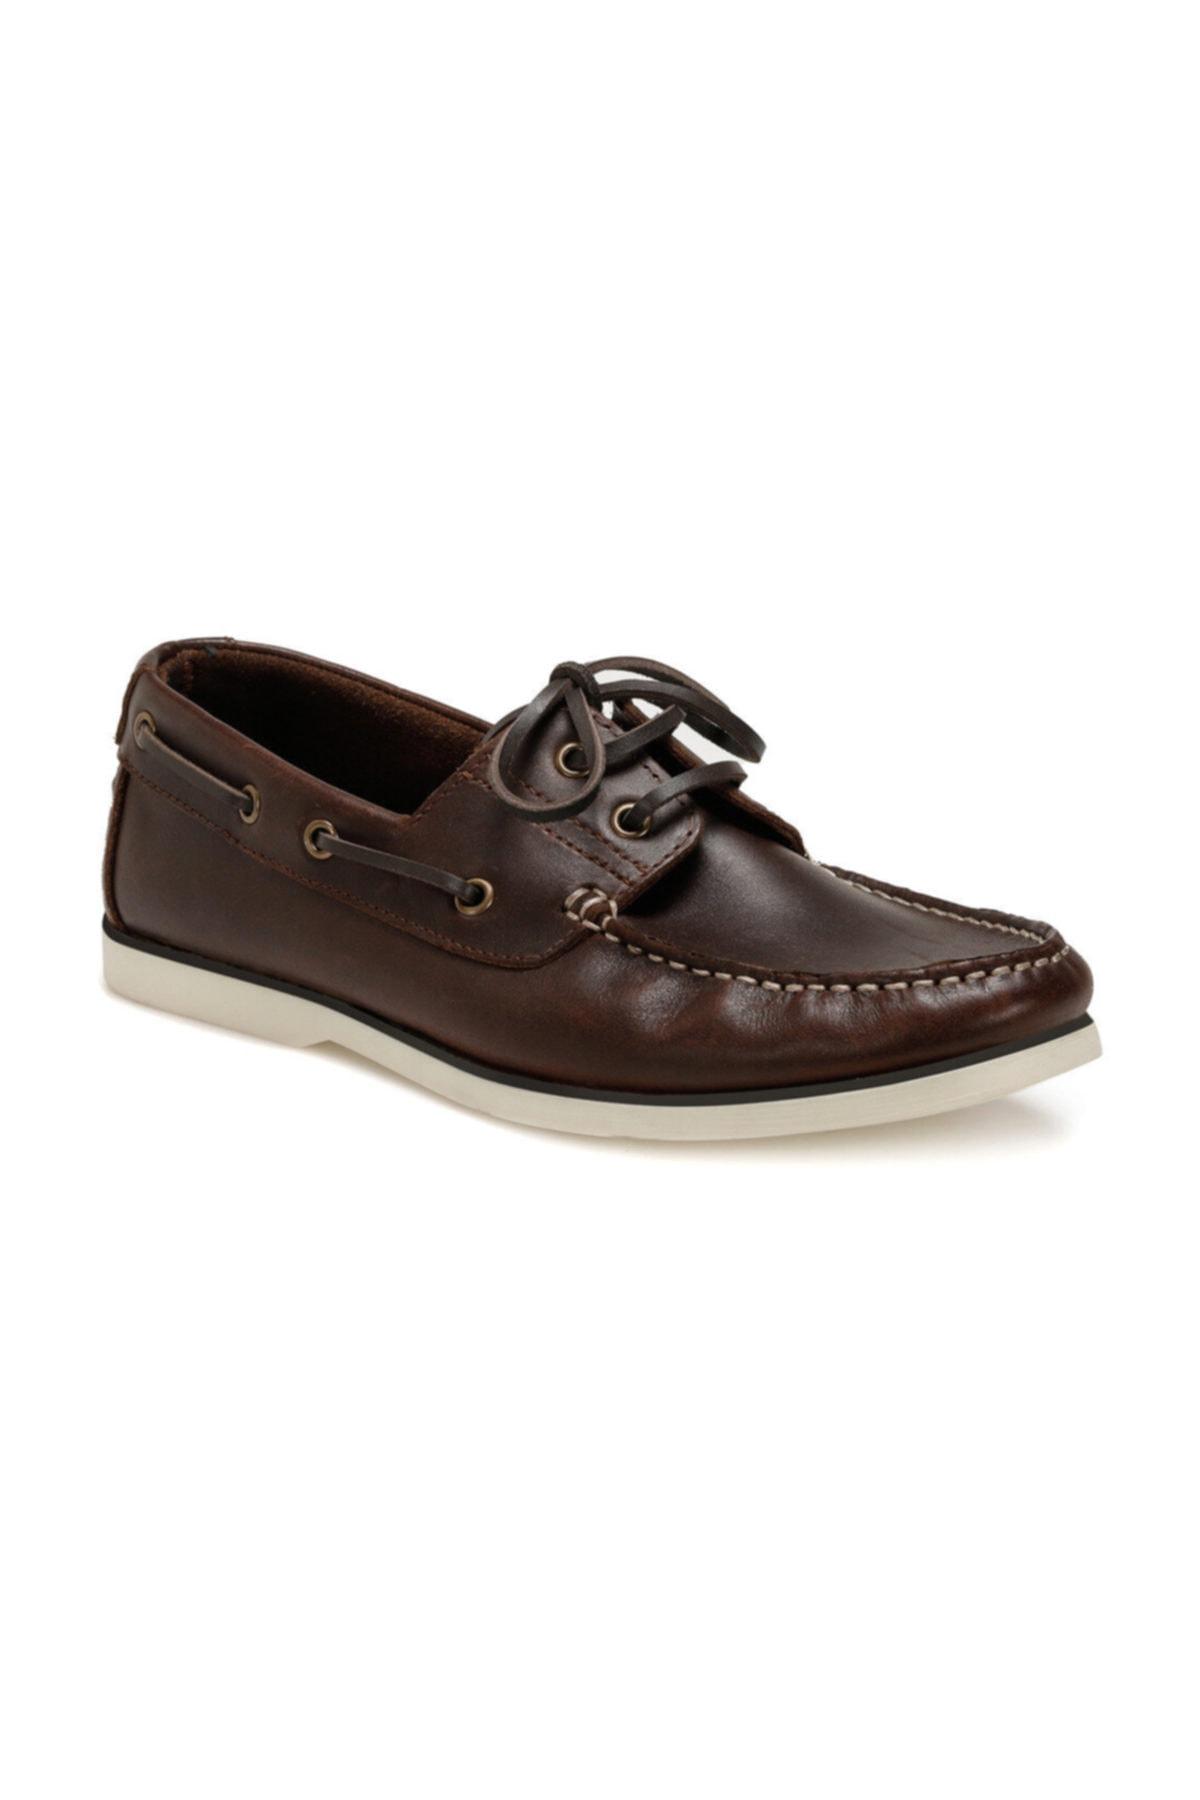 OXIDE MRB81 Kahverengi Erkek Ayakkabı 100518294 1